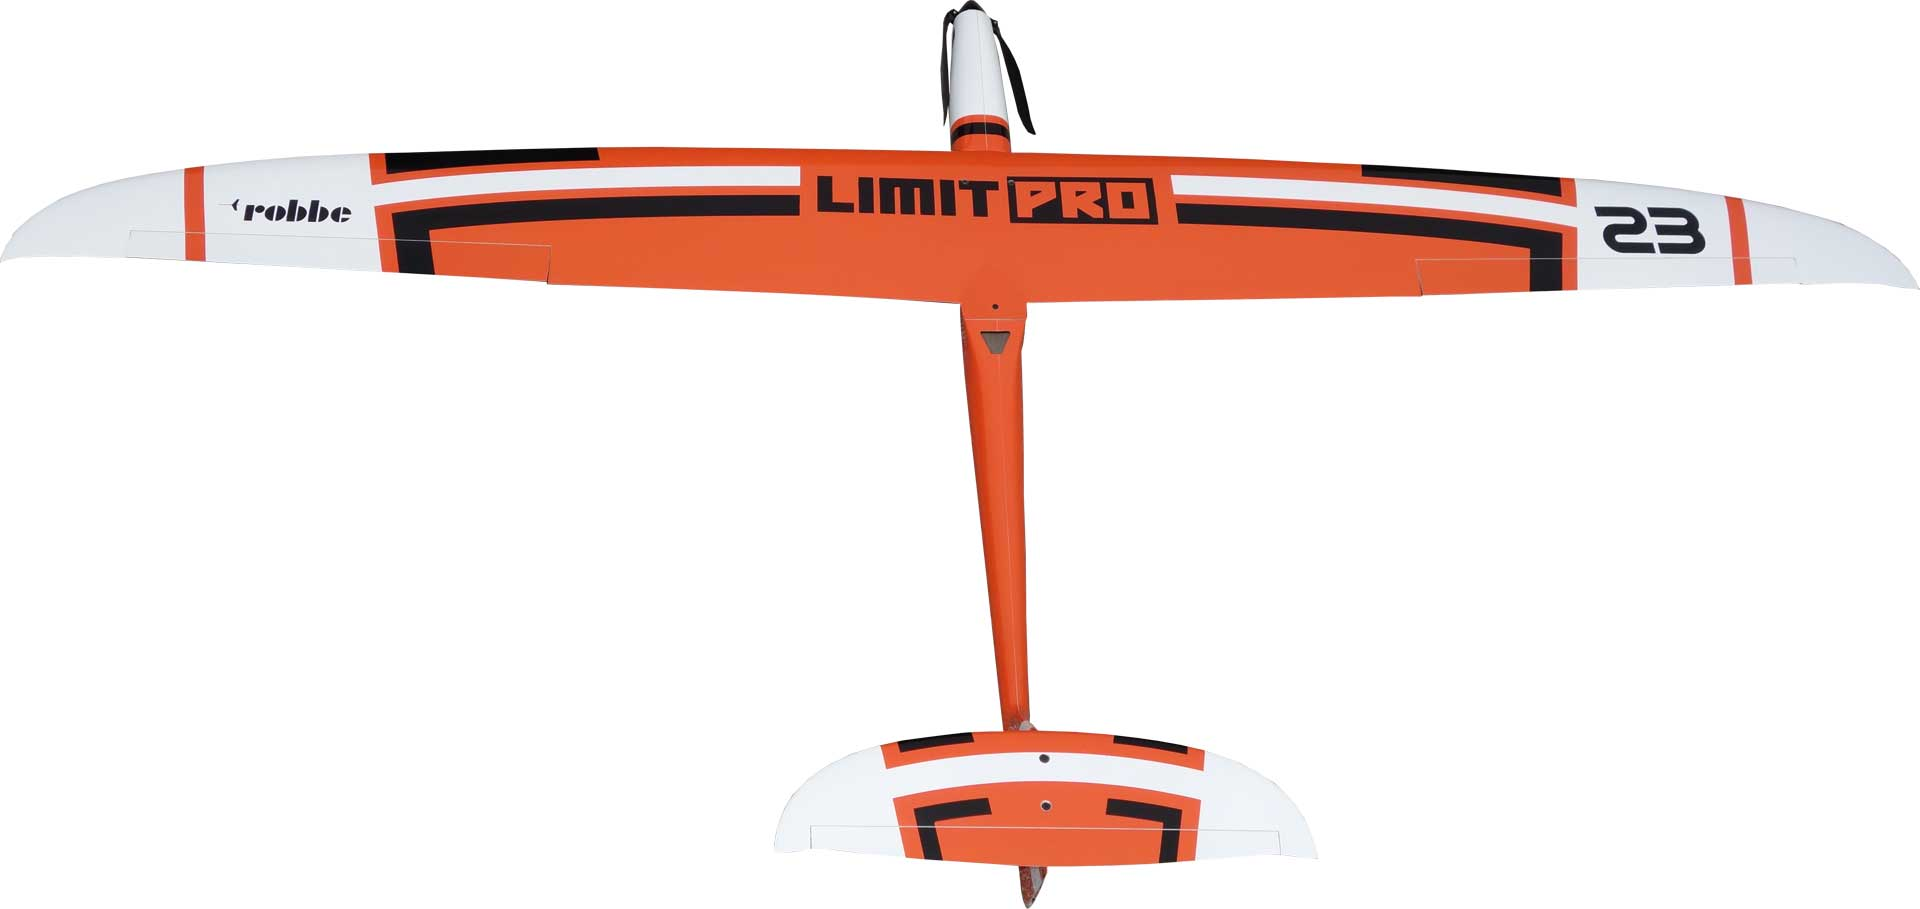 Robbe Modellsport Limit Pro ARF ORANGE Voll-GfK/CfK